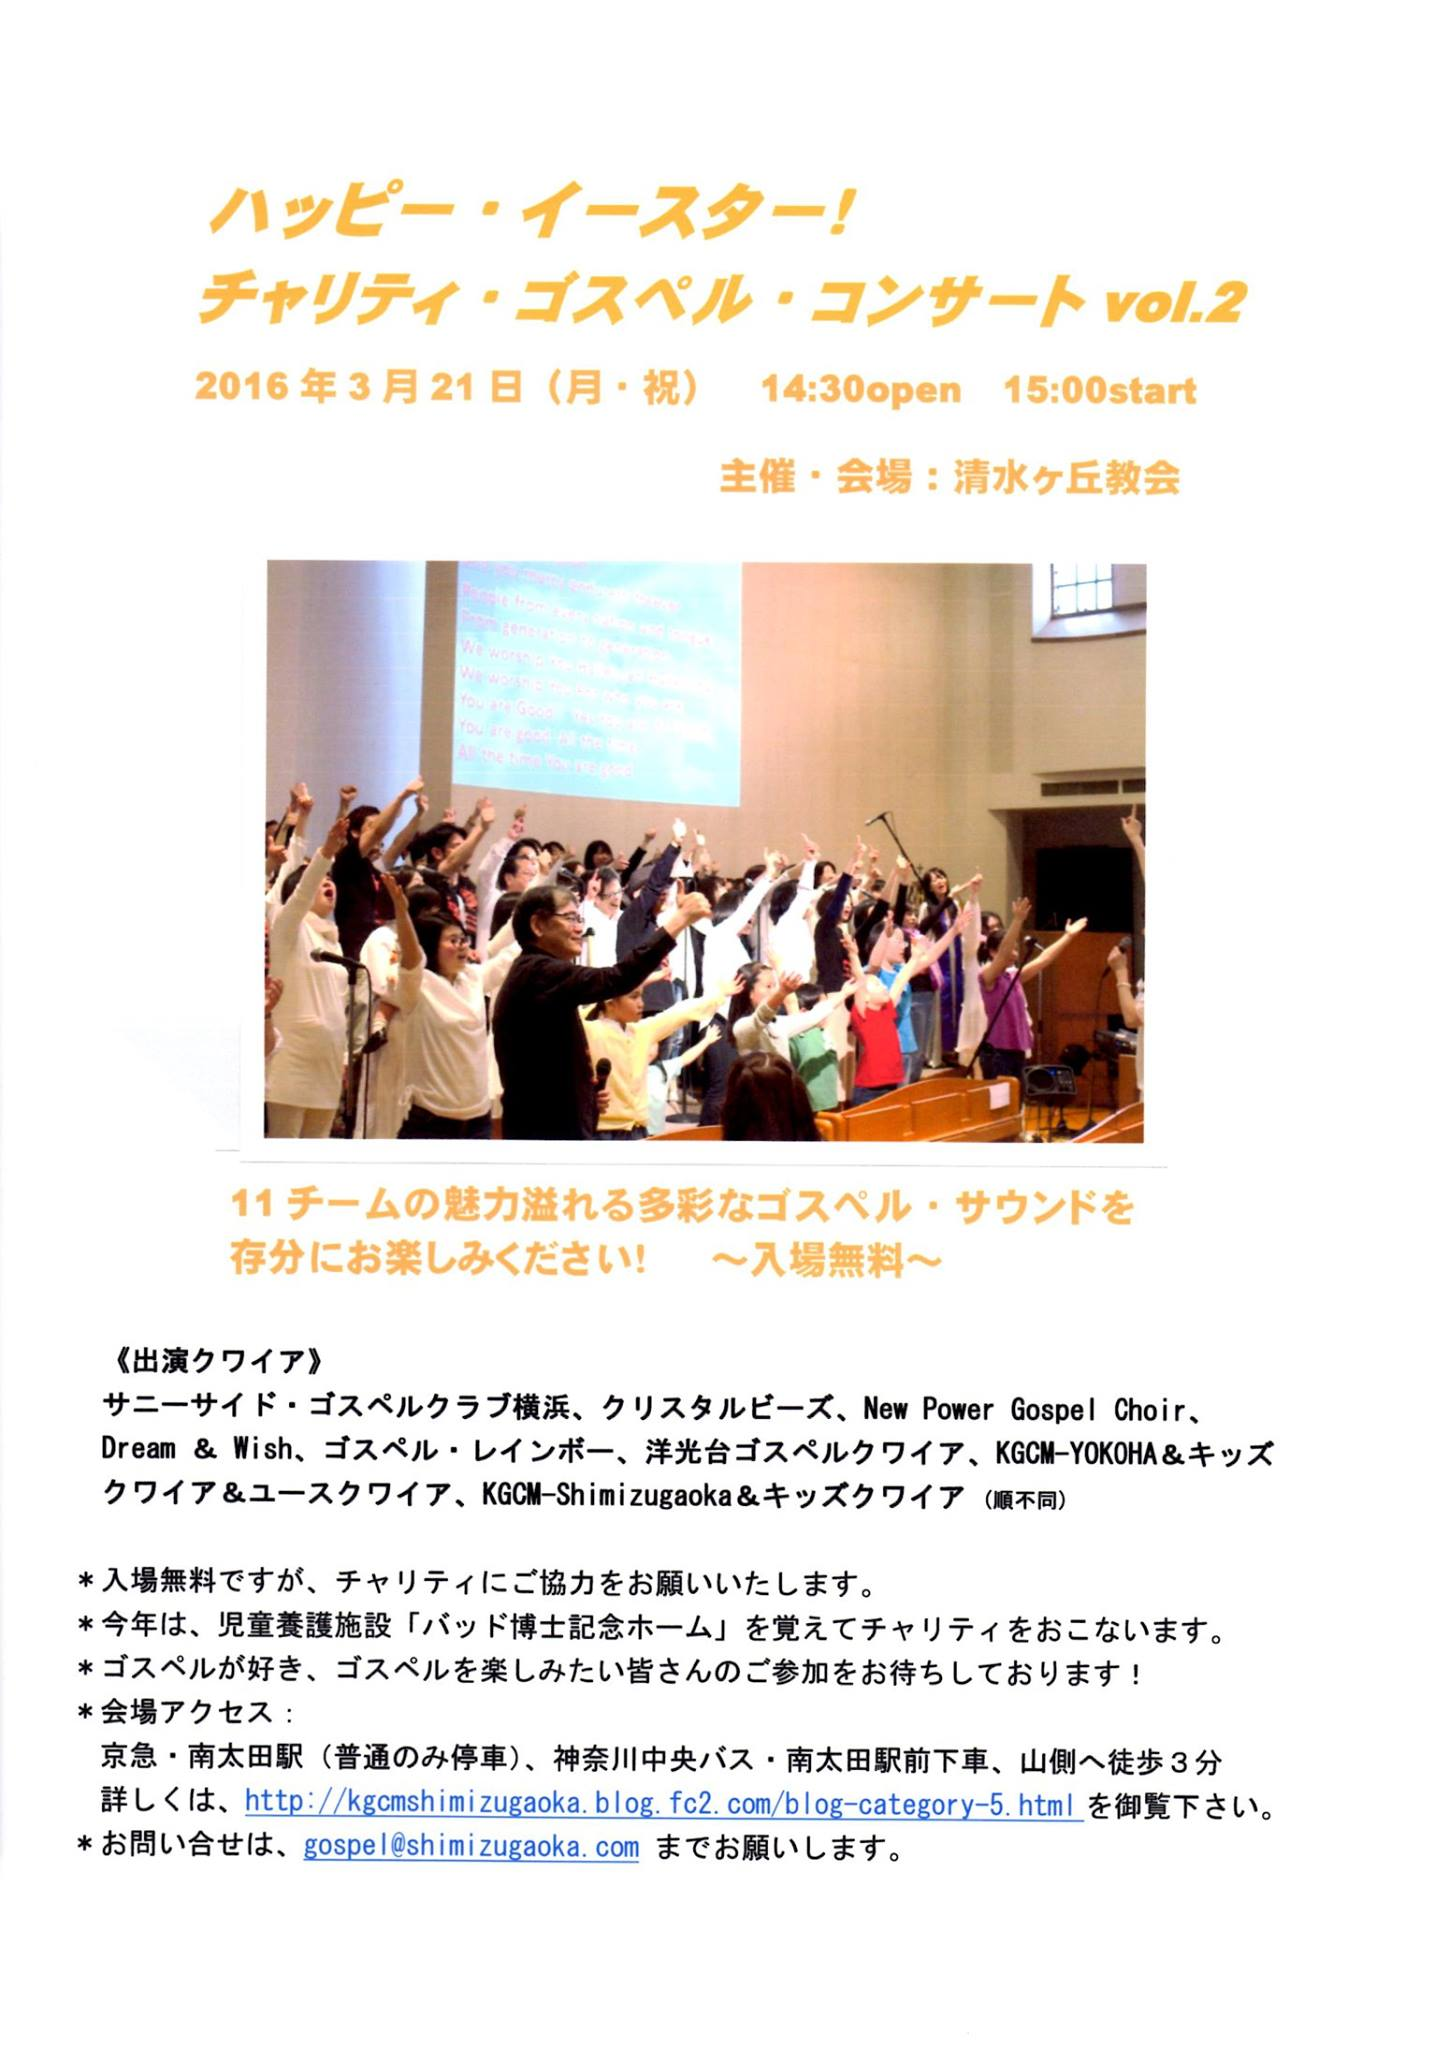 Shimizugaoka Easter Gospel Concert 2016